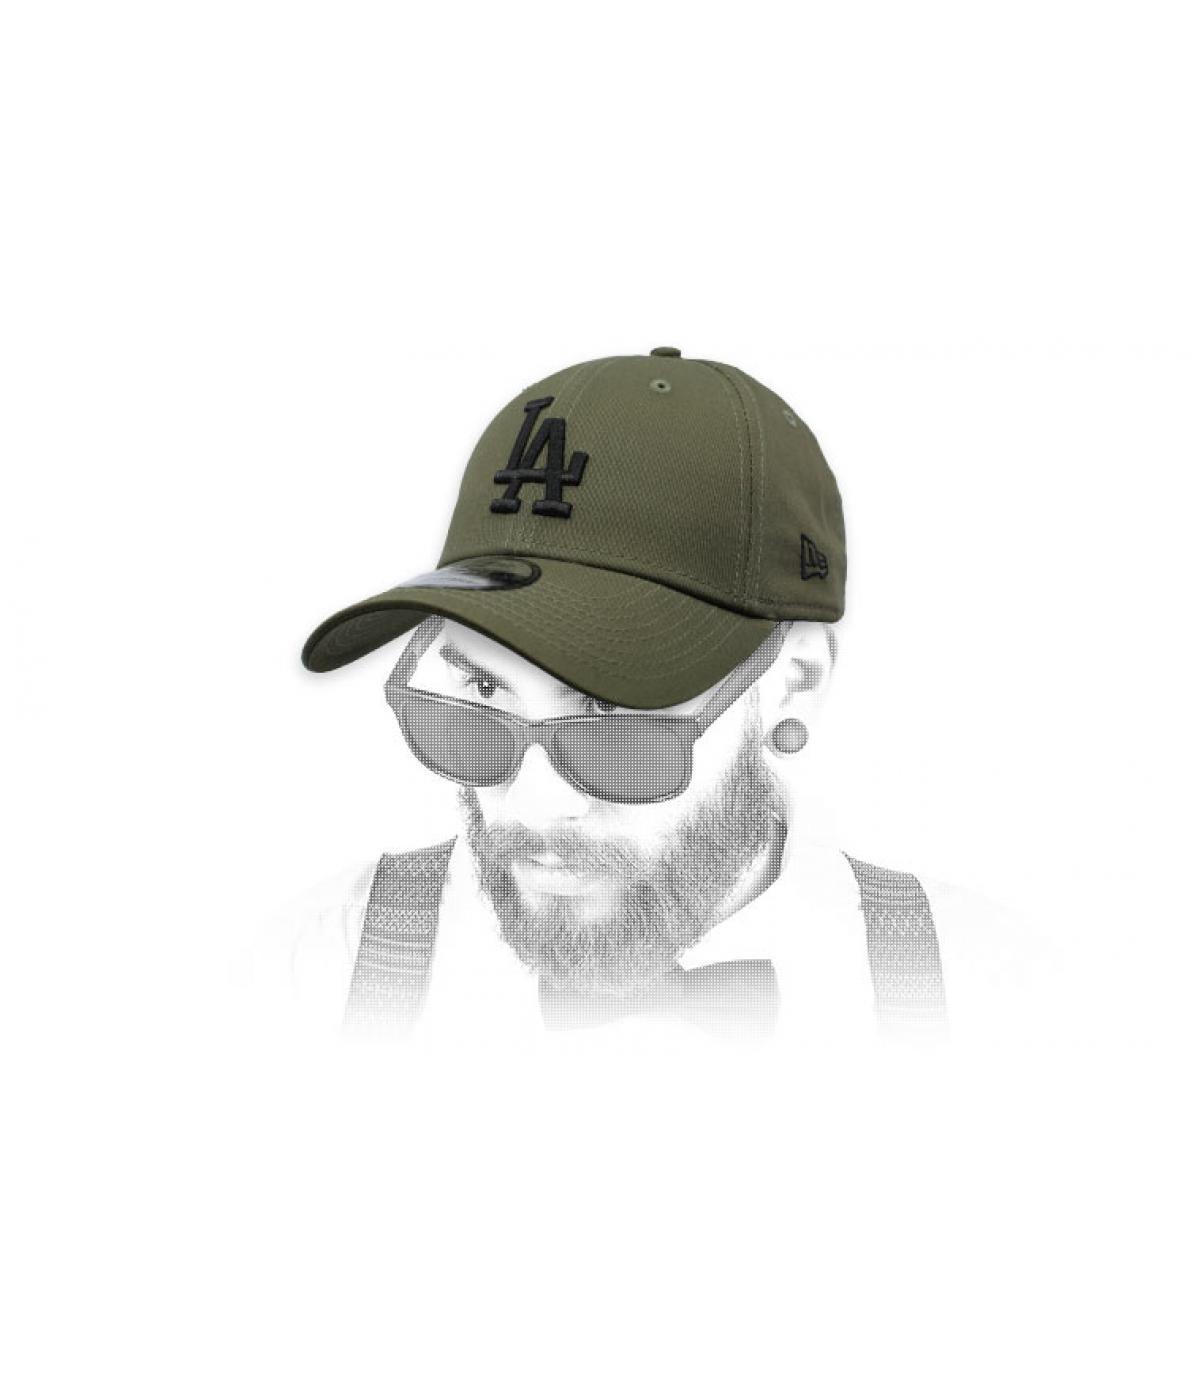 kap LA groen grijs